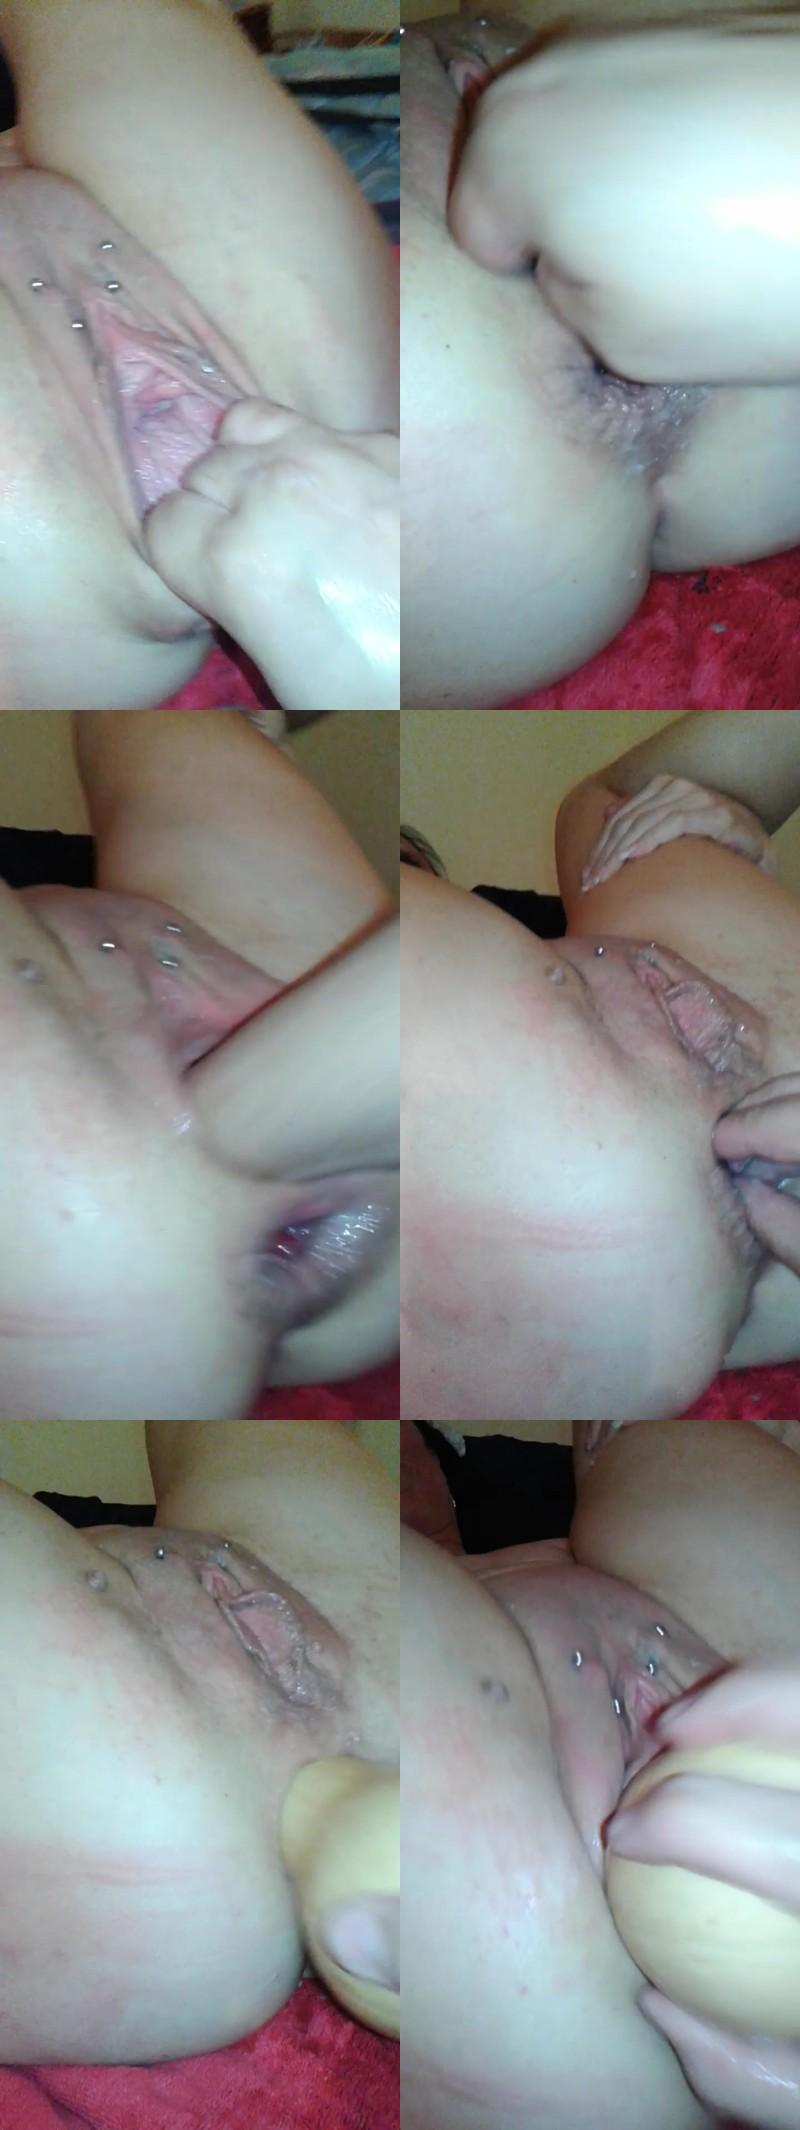 Hot babe boobs free live